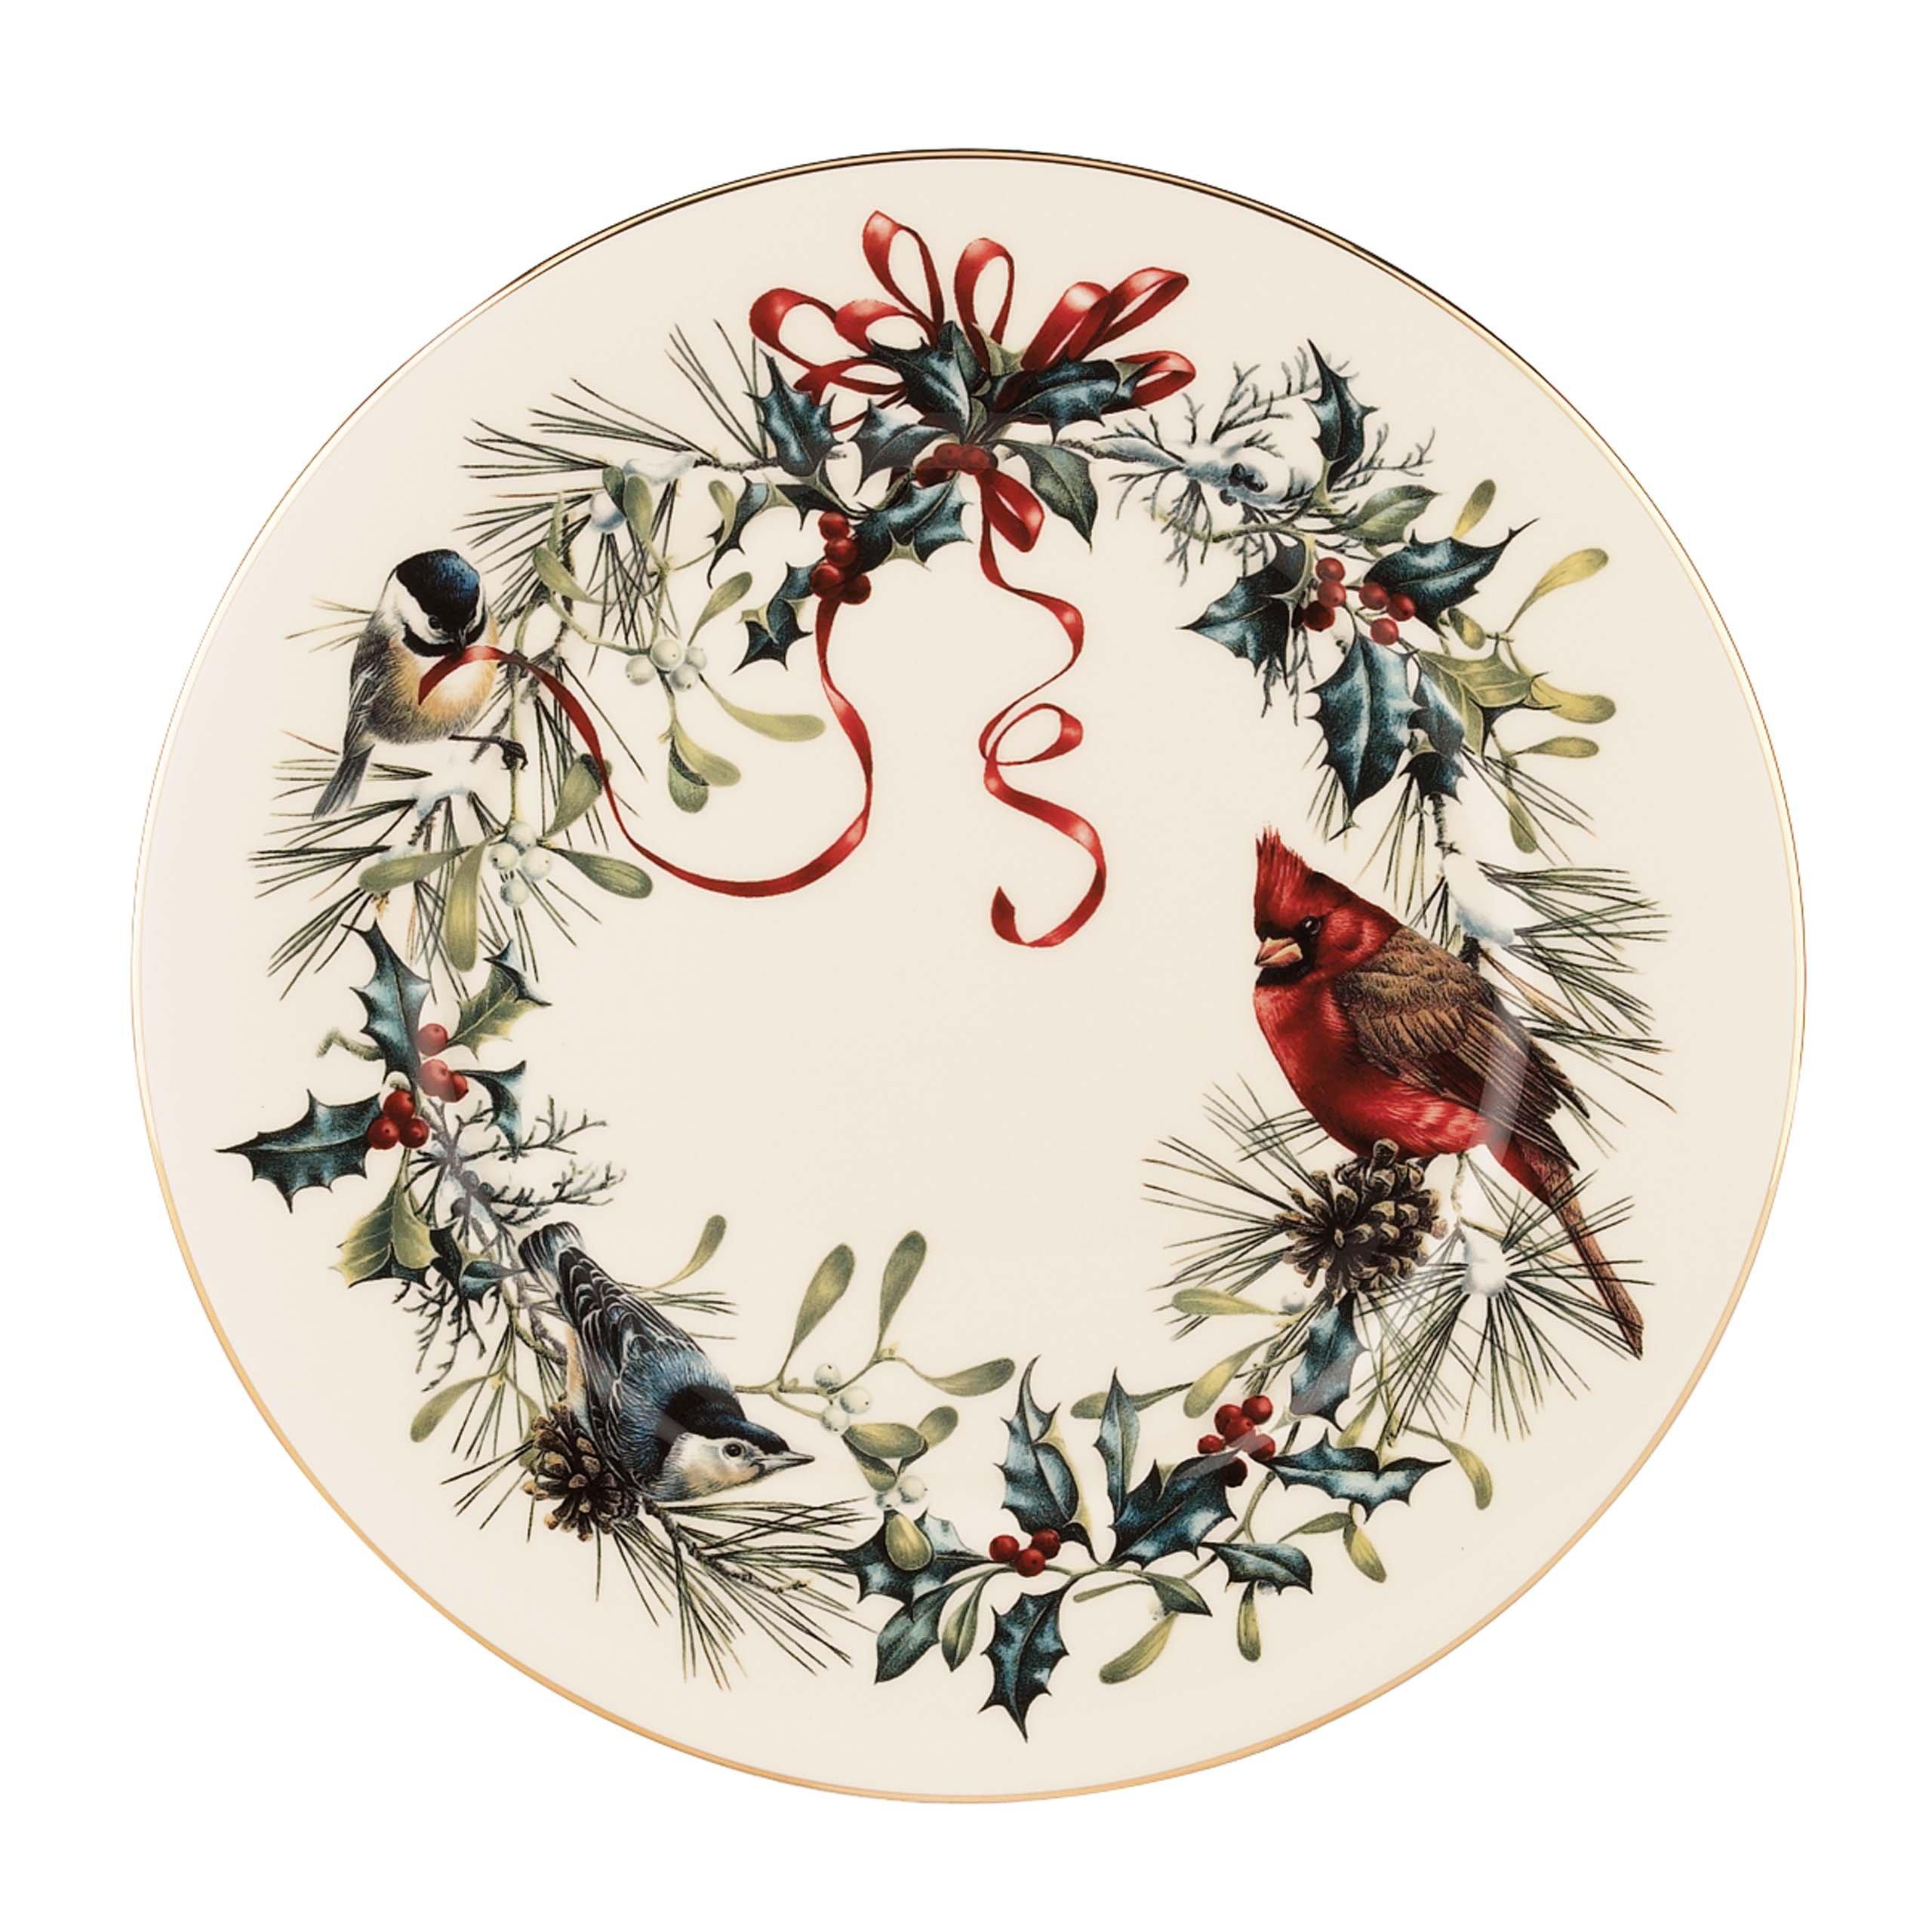 Lenox Winter Greetings Dinner Plate,Ivory, Gold